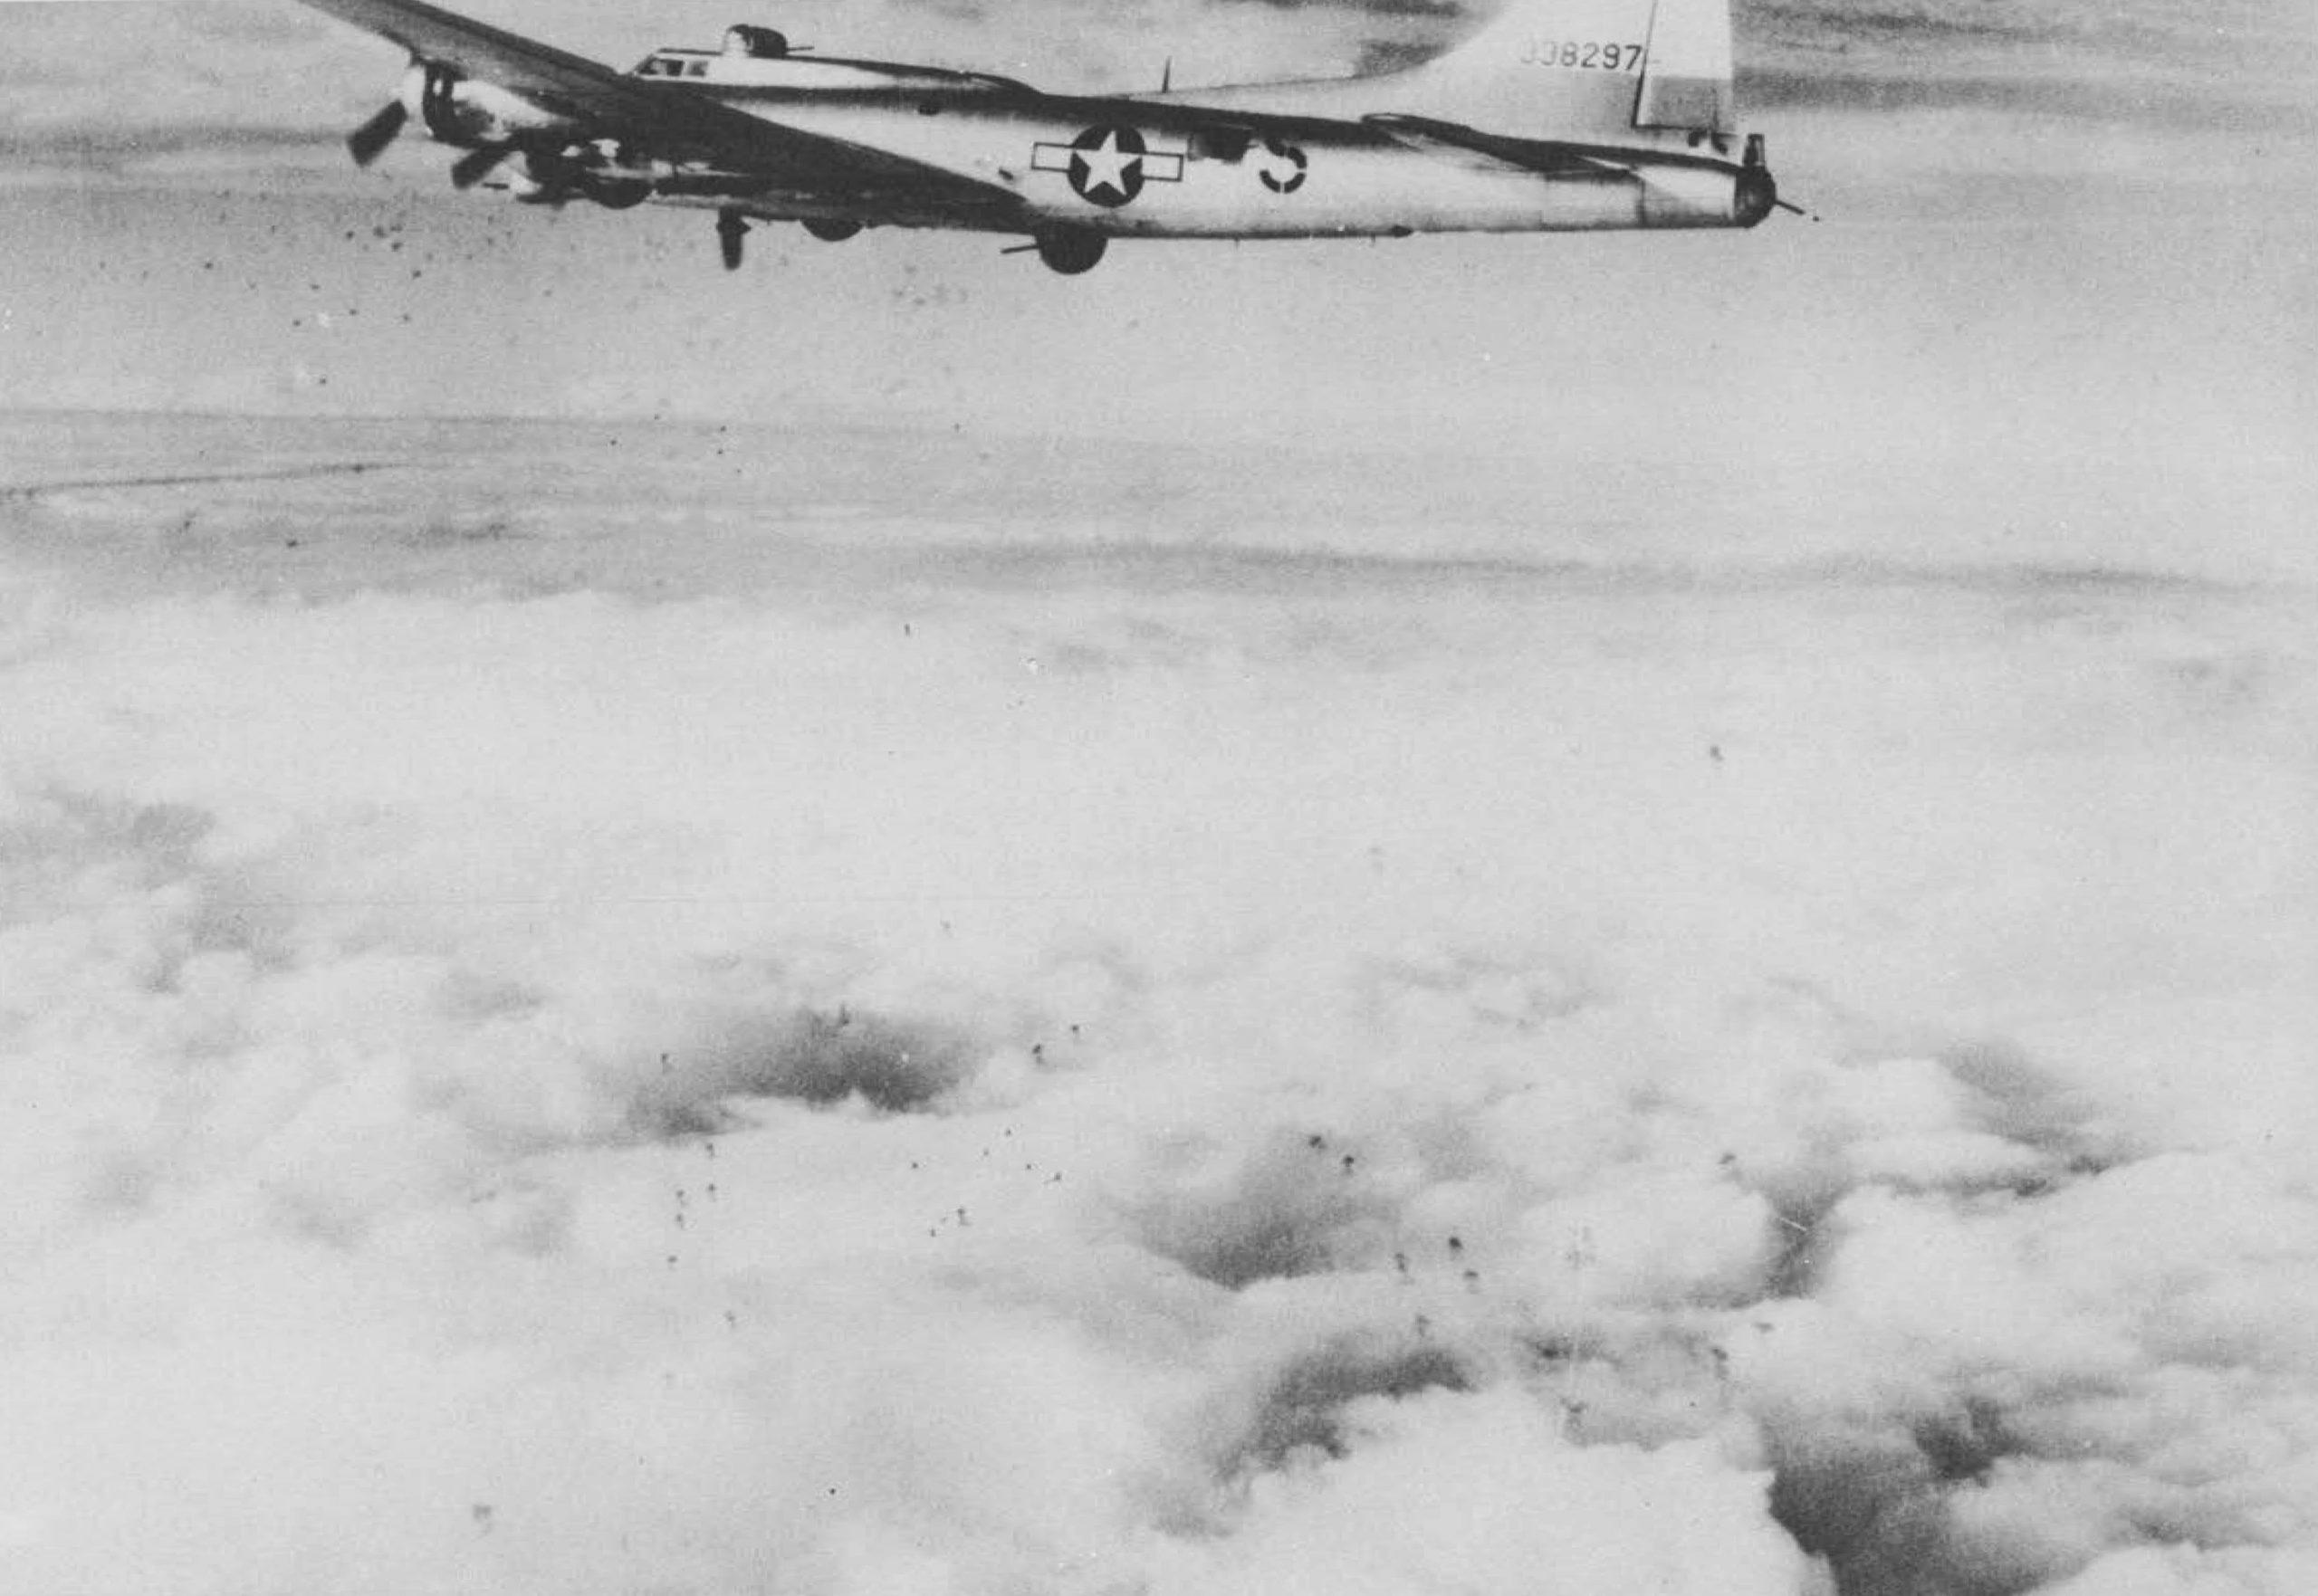 B-17 #43-38297